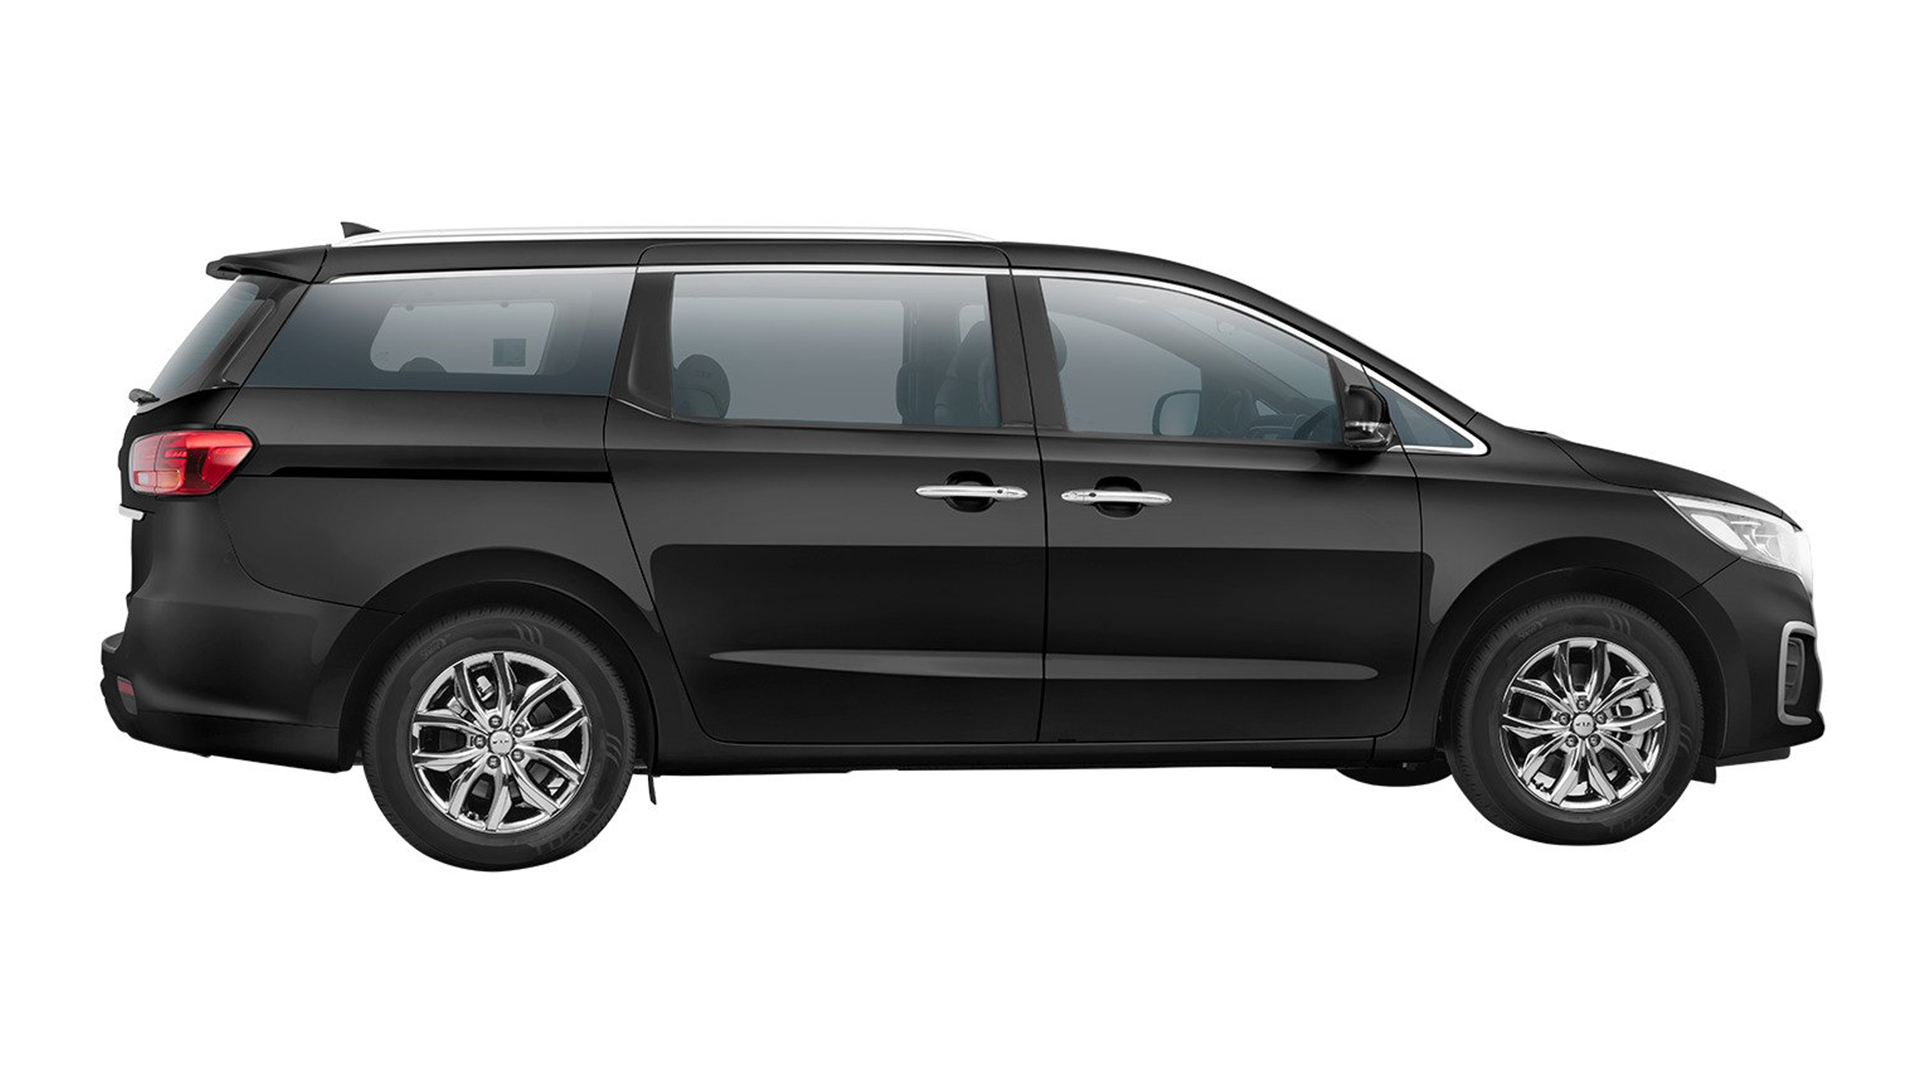 Kia Carnival 2020 Limousine 7VIP Exterior